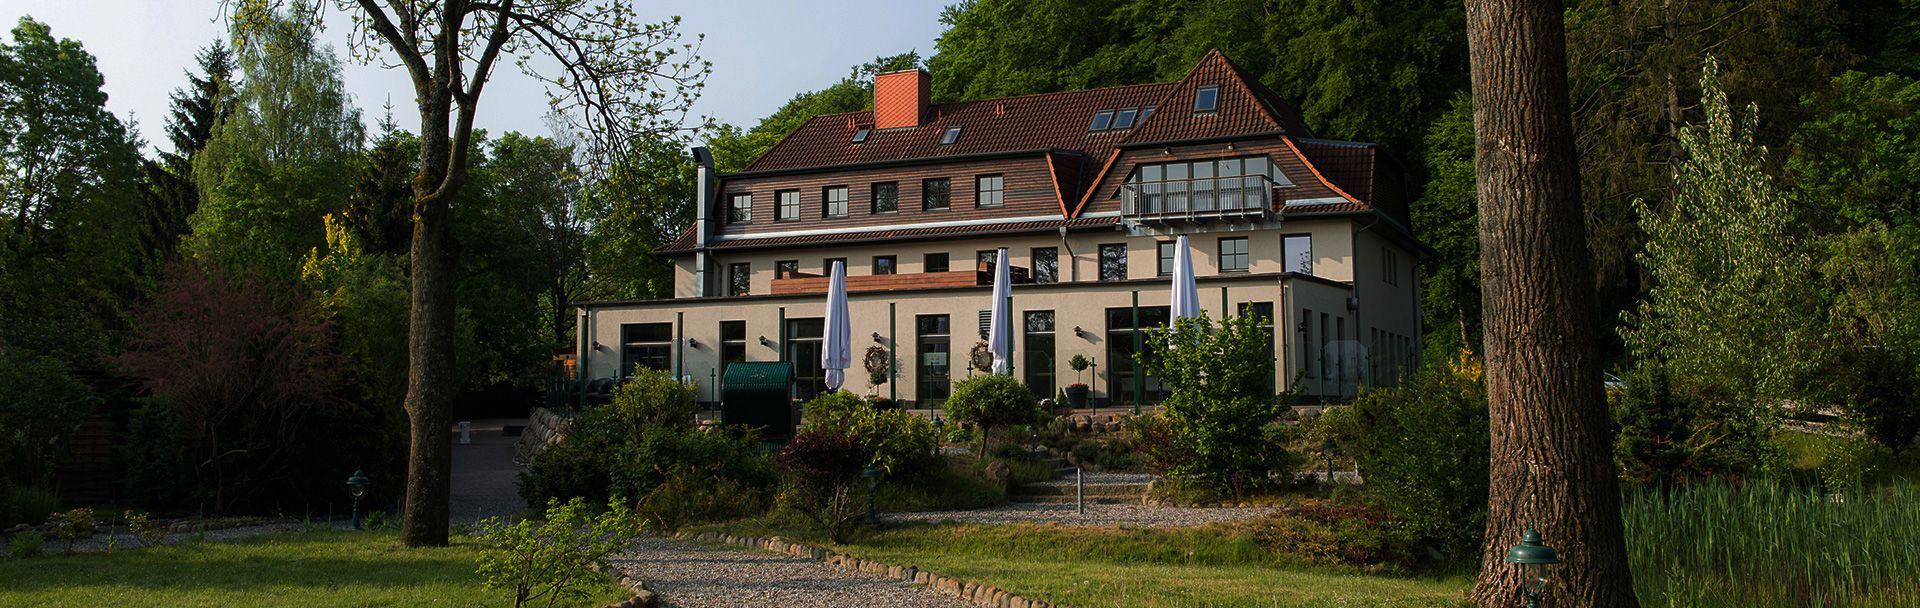 Eventlocation in Schwerin